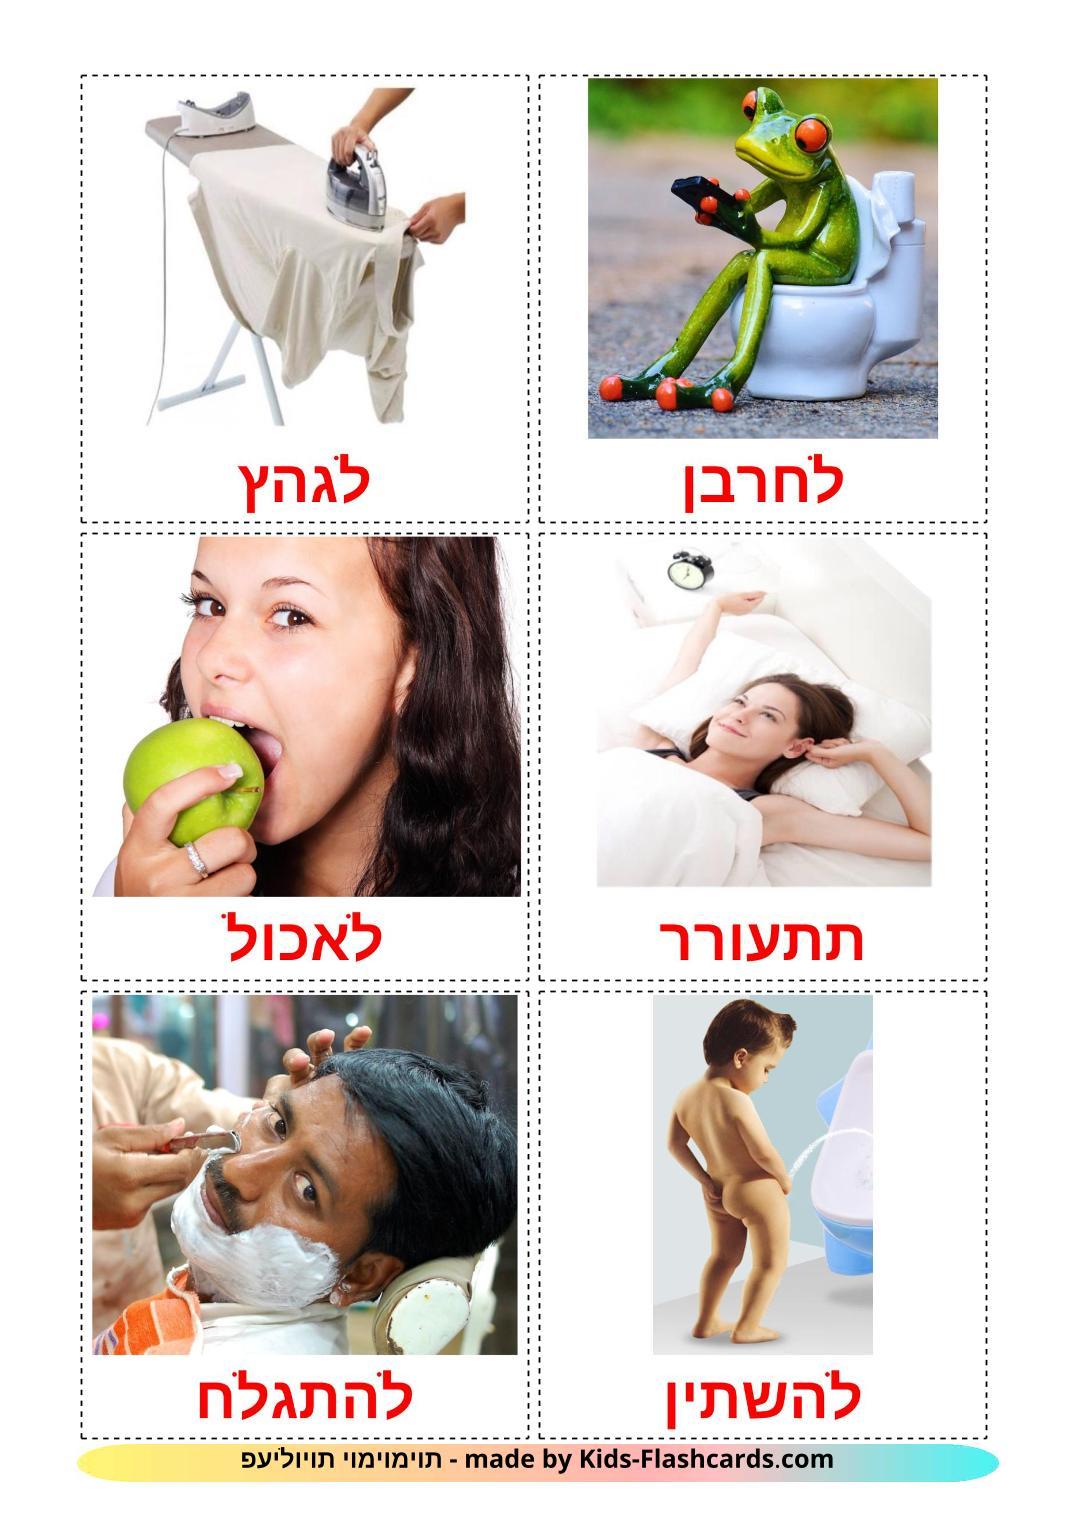 Routine verbs - 33 Free Printable hebrew Flashcards